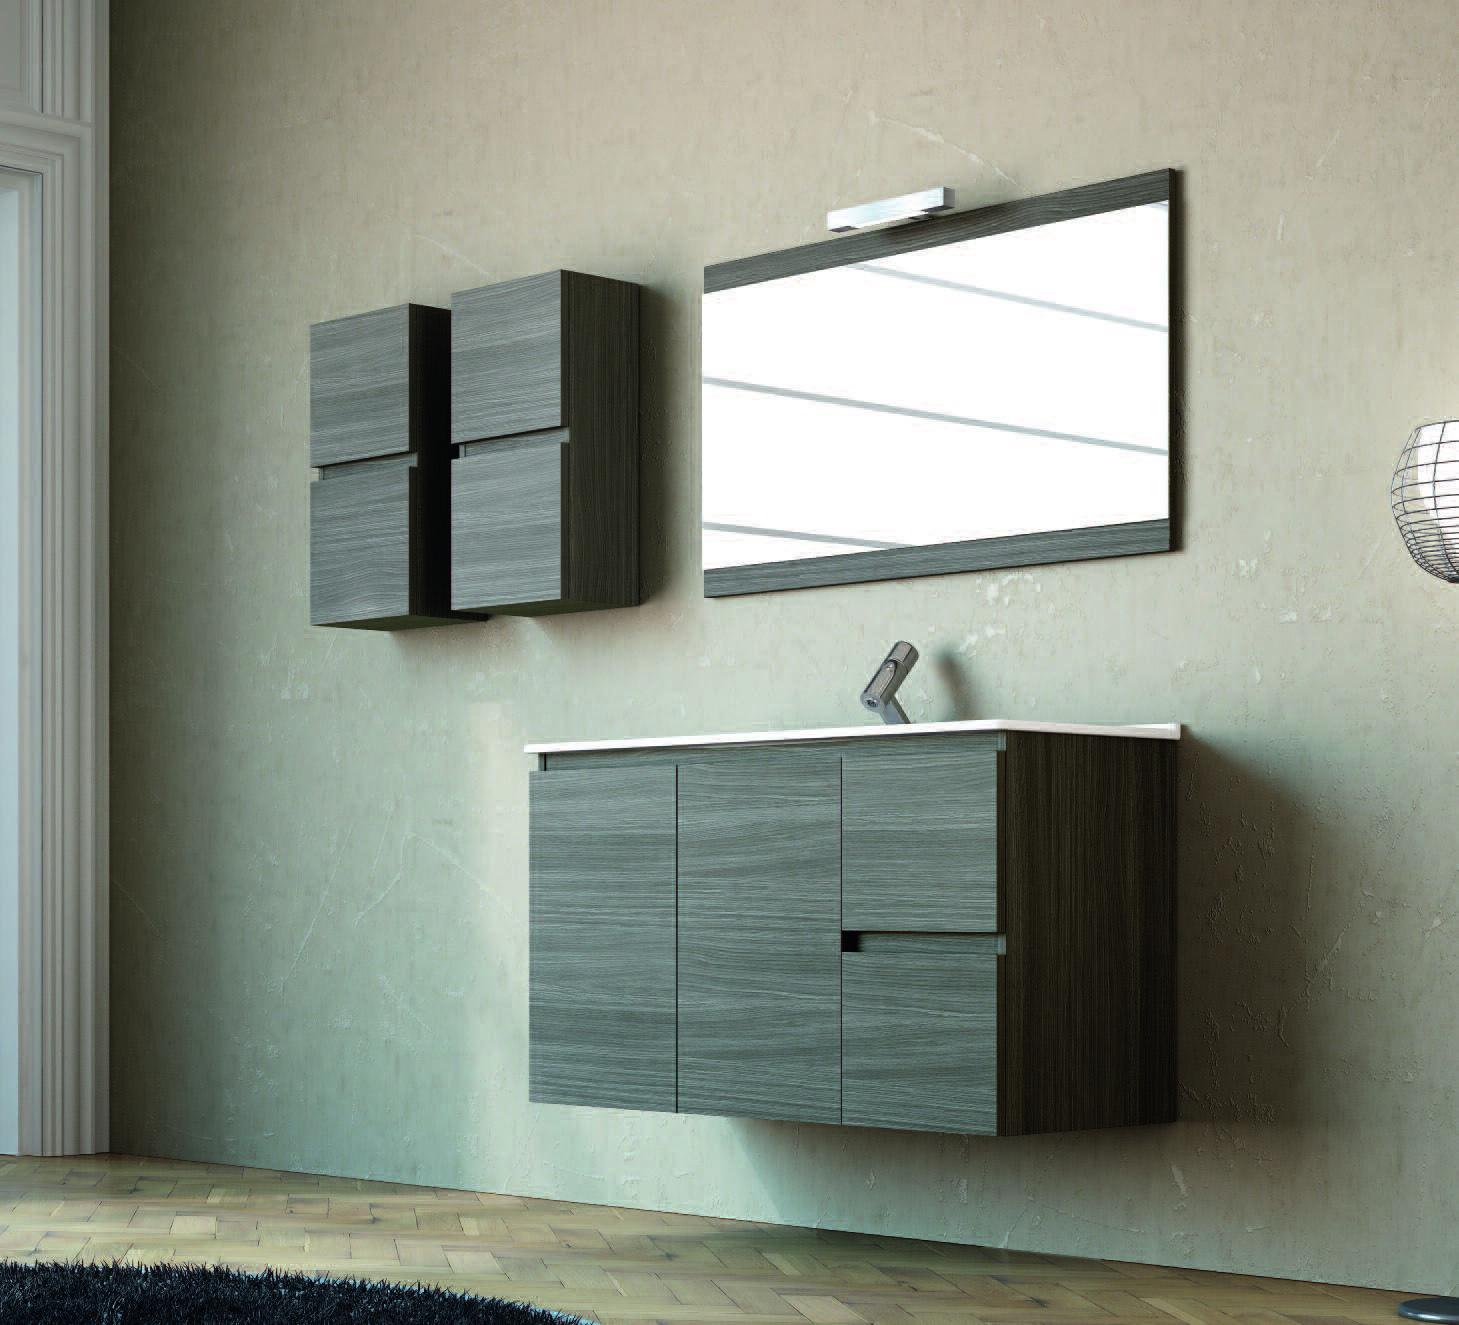 awesome resultado de imagen para muebles bao with muebles de bao modernos baratos with baos modernos y baratos - Muebles De Baos Baratos